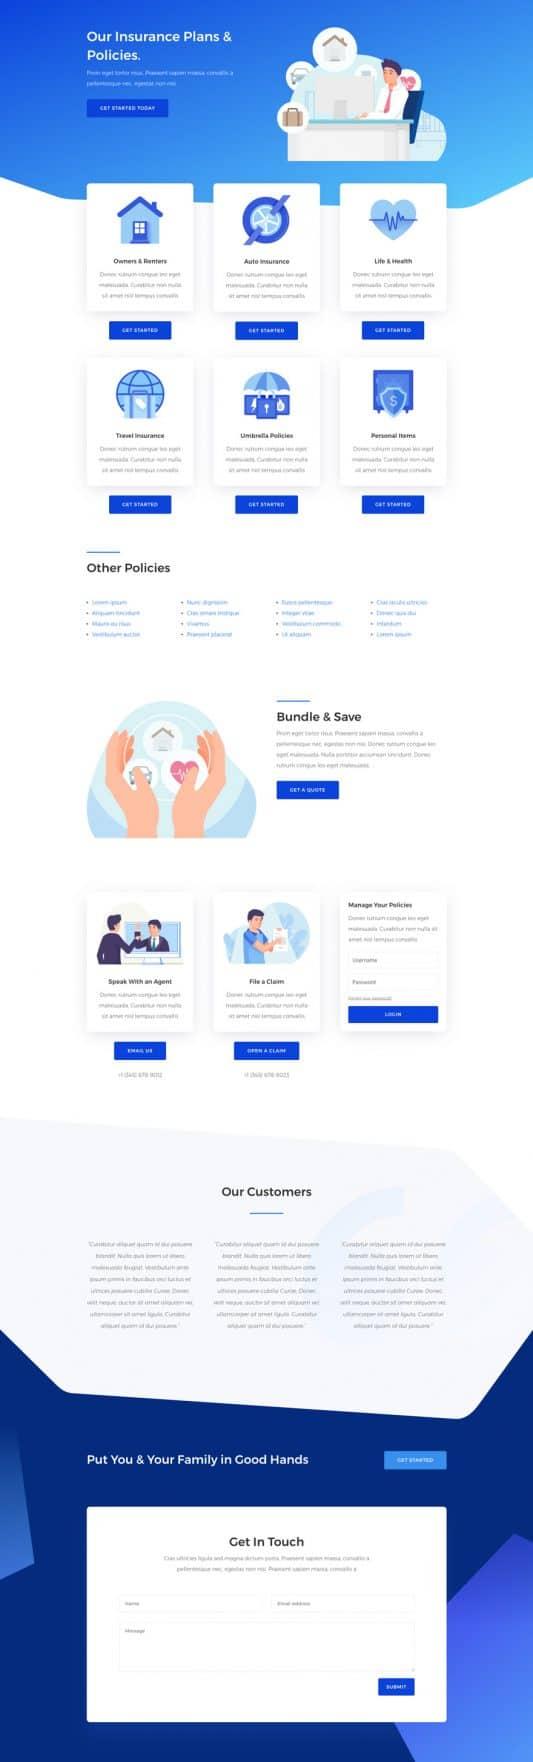 Insurance Agency Web Design 7